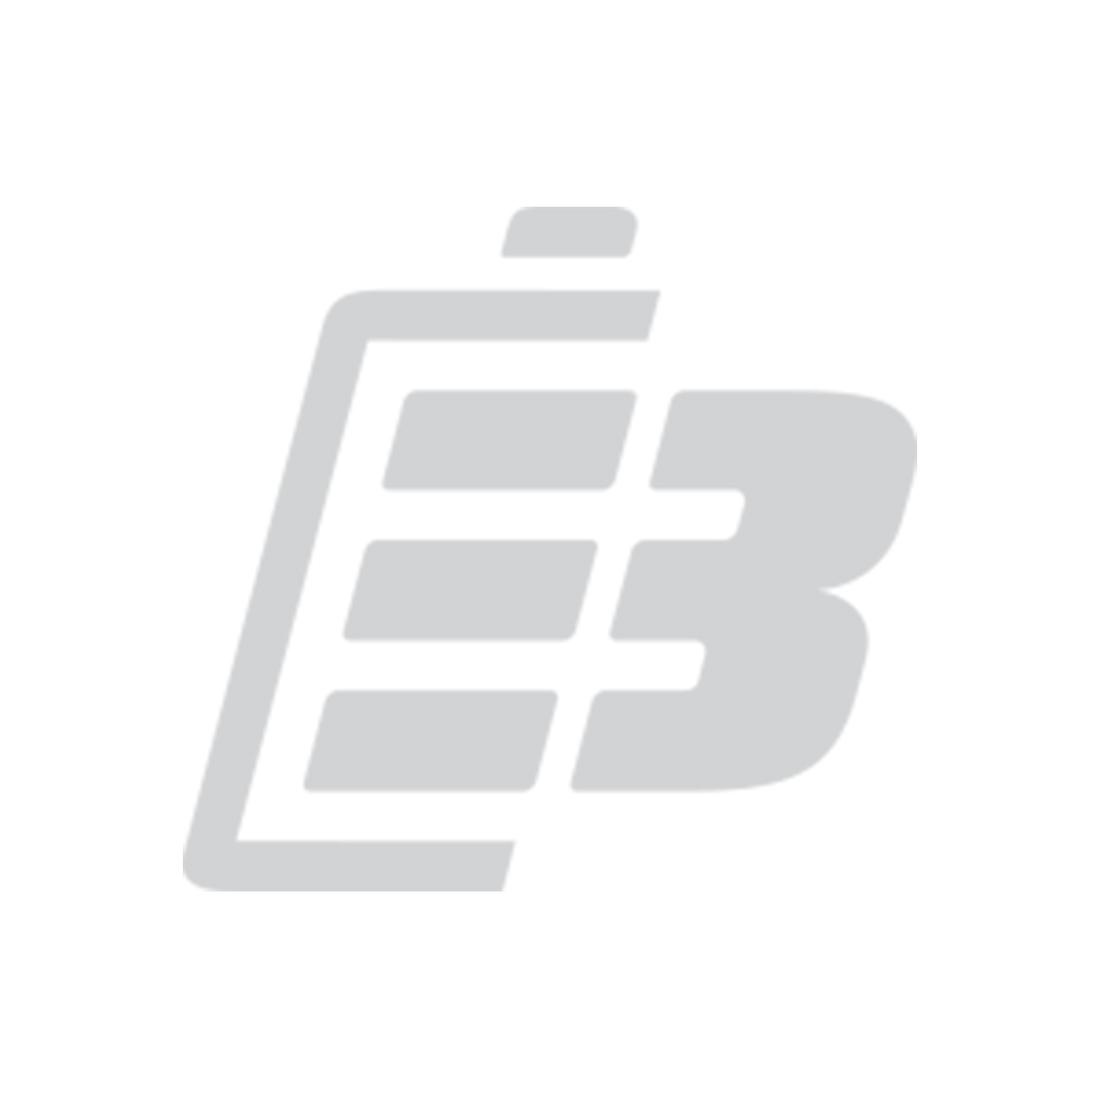 Two-Way radio battery Icom BP-264_1